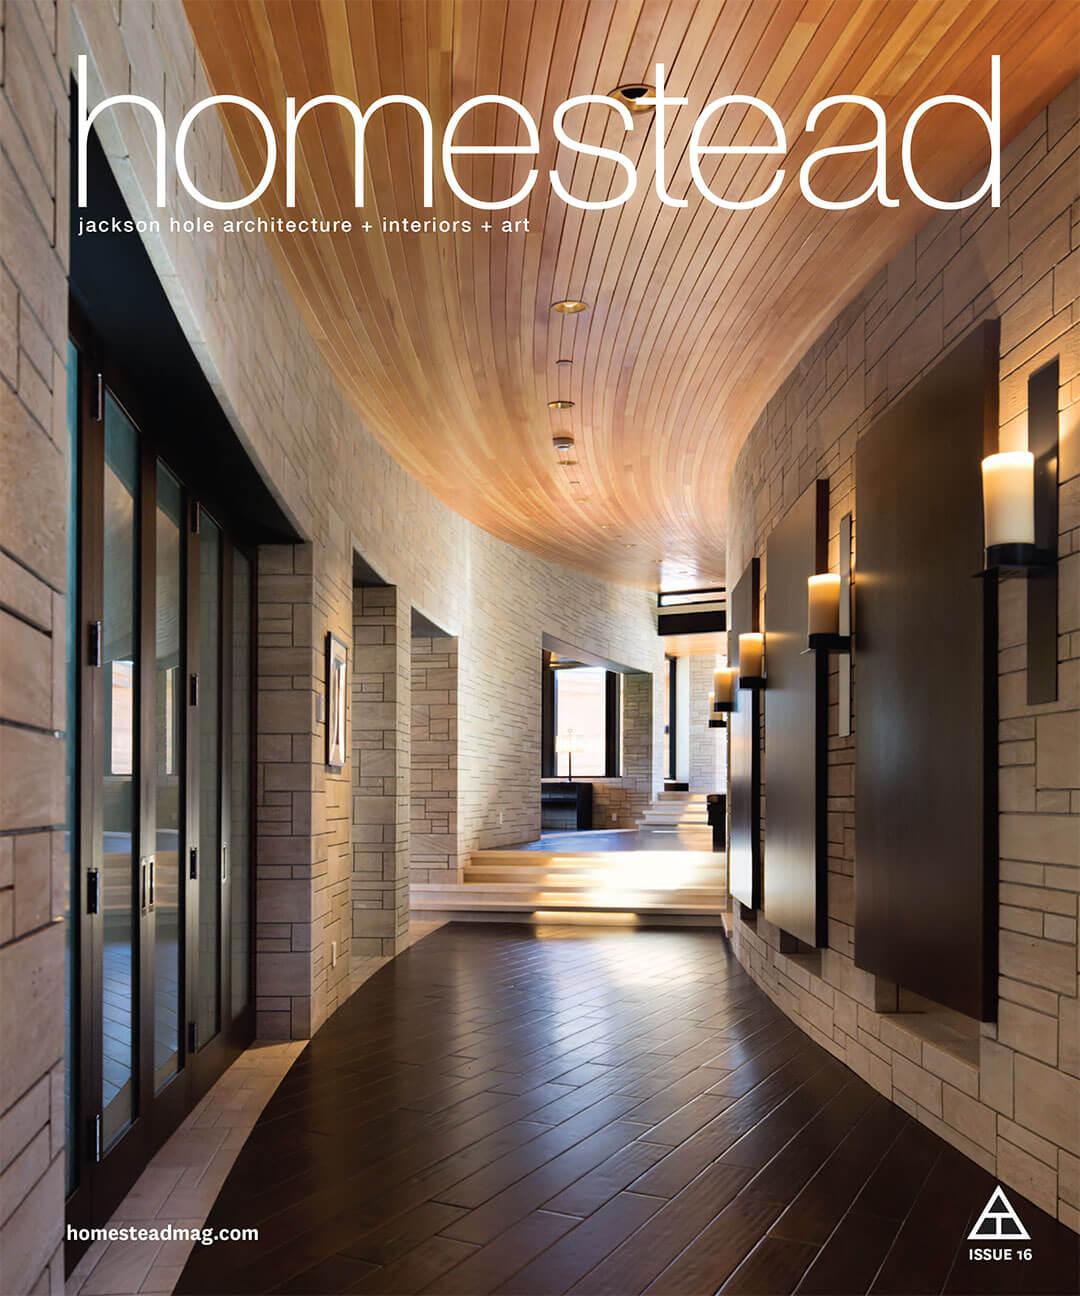 Homestead Magazine feature article.